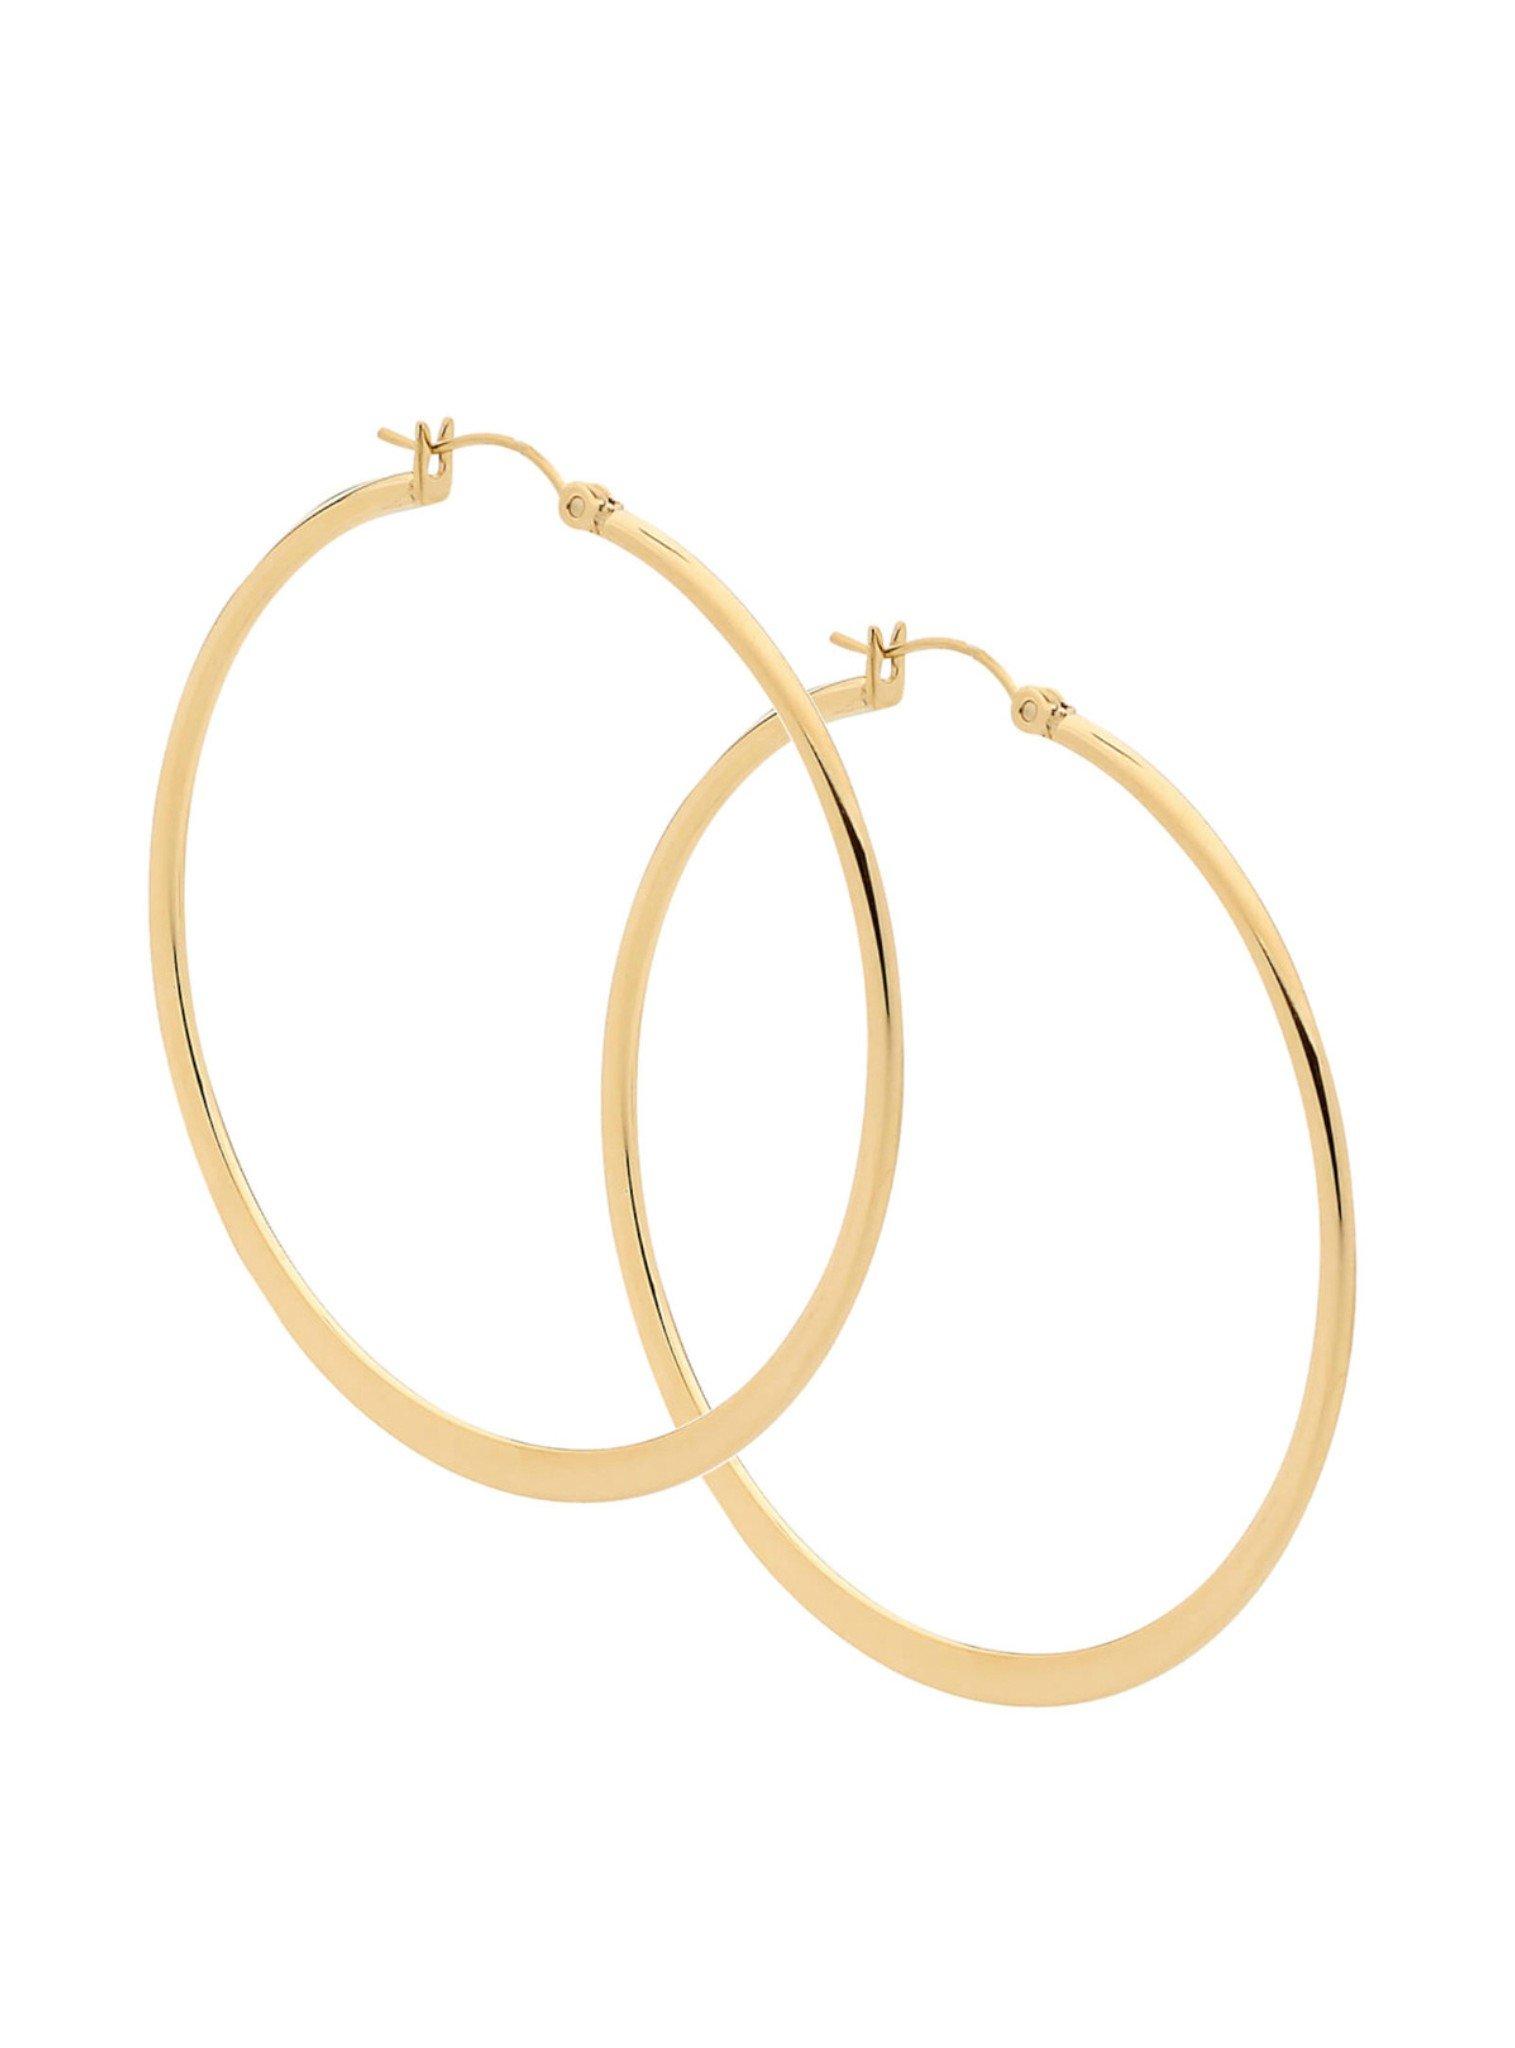 Large Hoop Earrings in Yellow Gold Steel